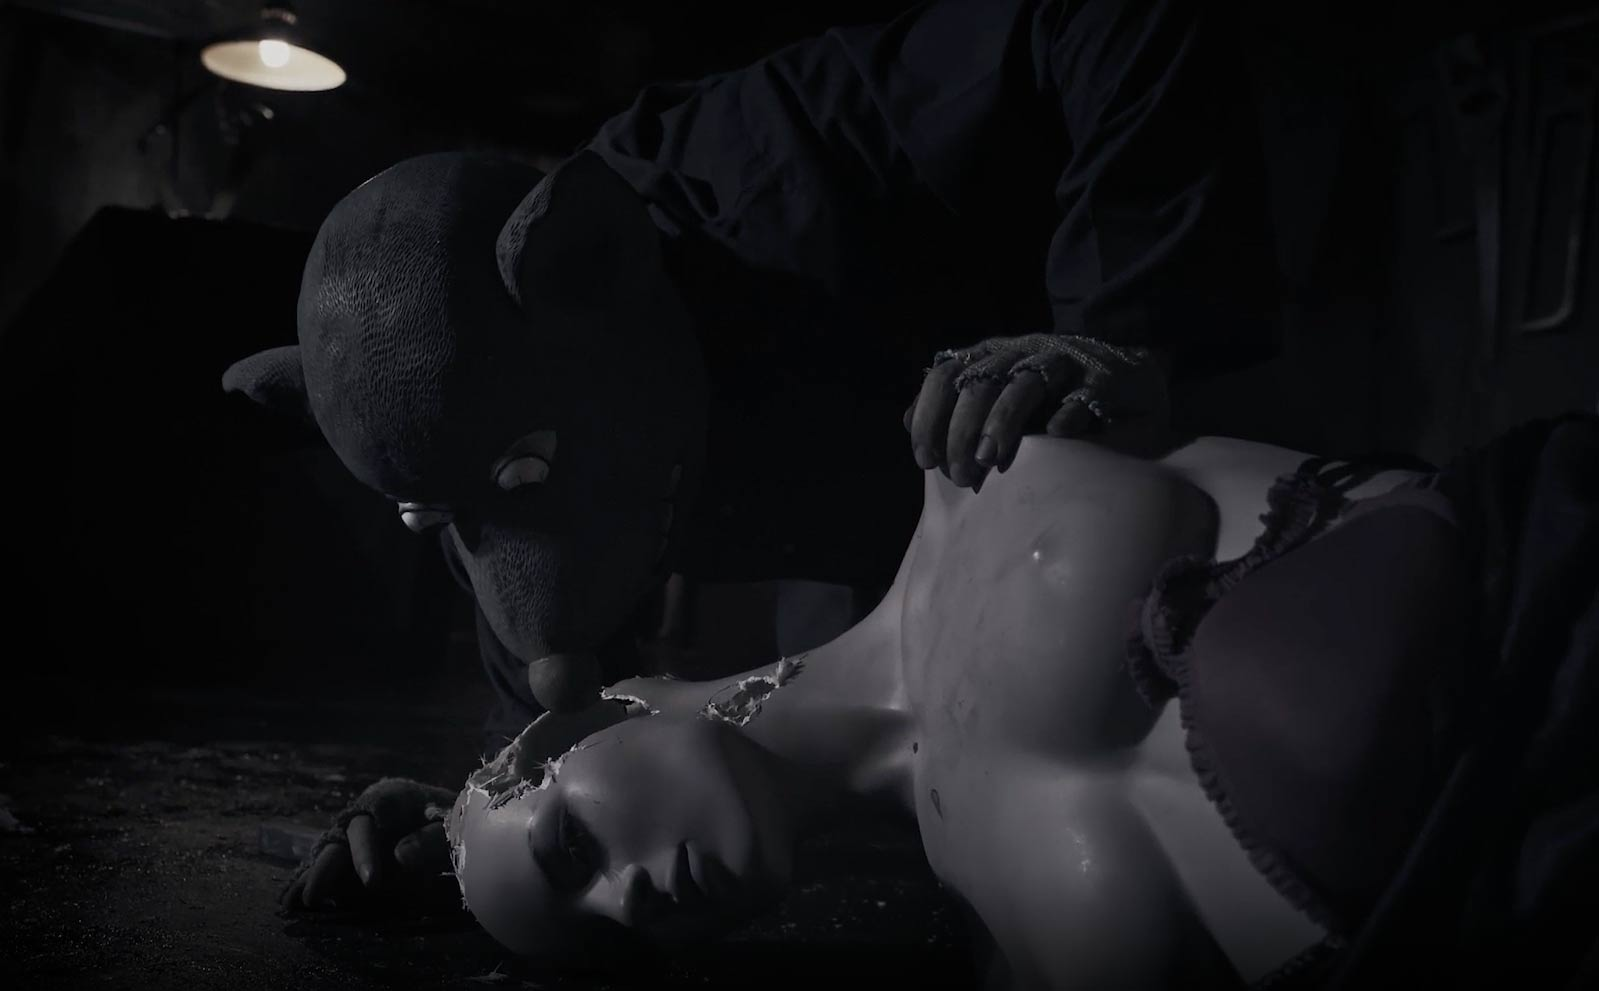 Roger the Rat – The Film, by Roger Ballen. Still